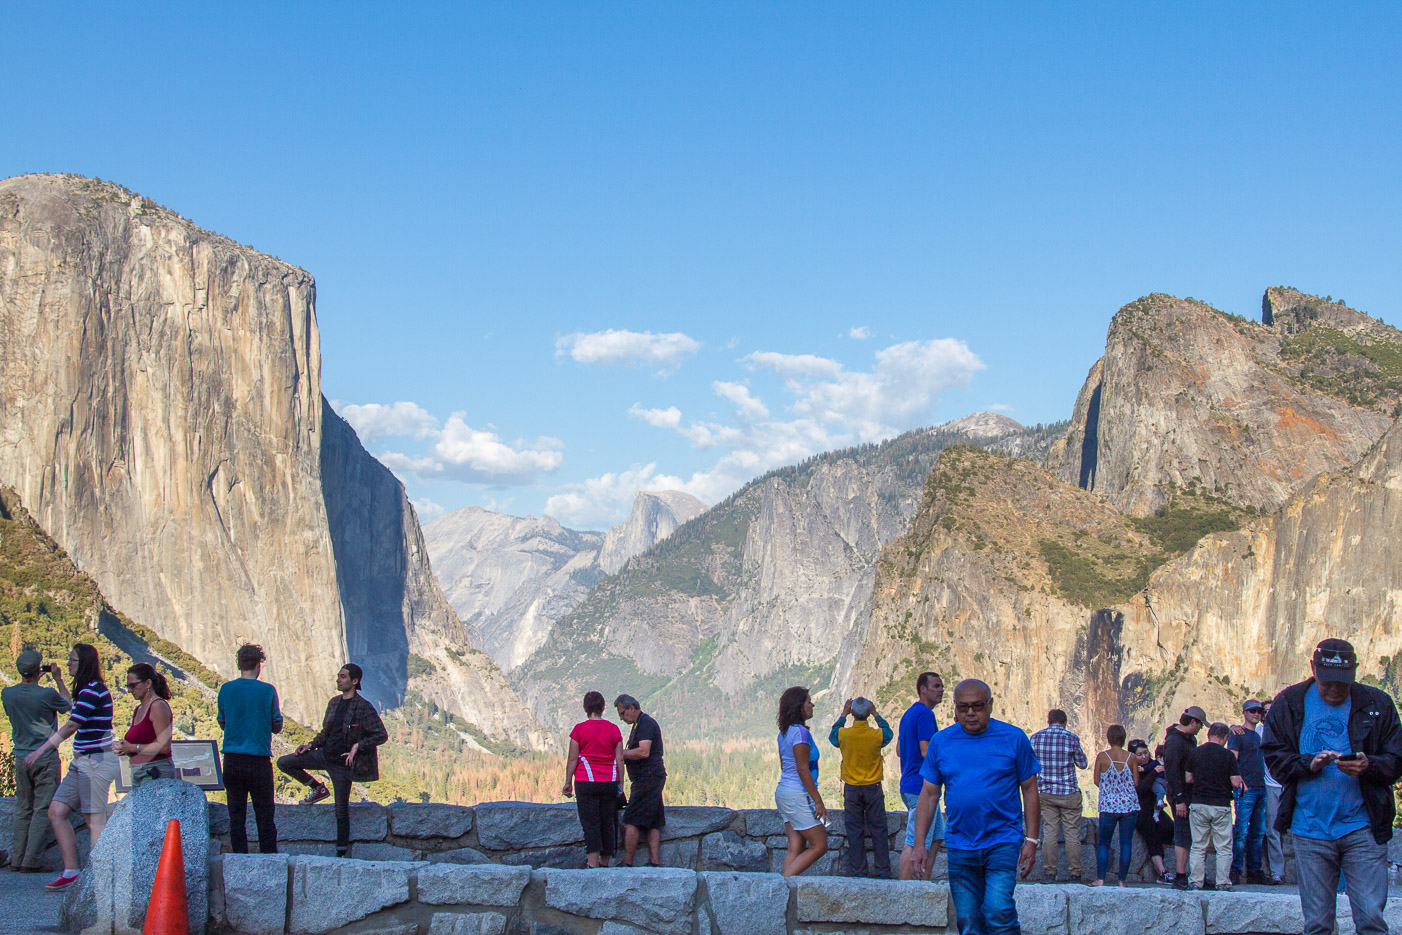 Turister vid Tunnel View i Yosemite